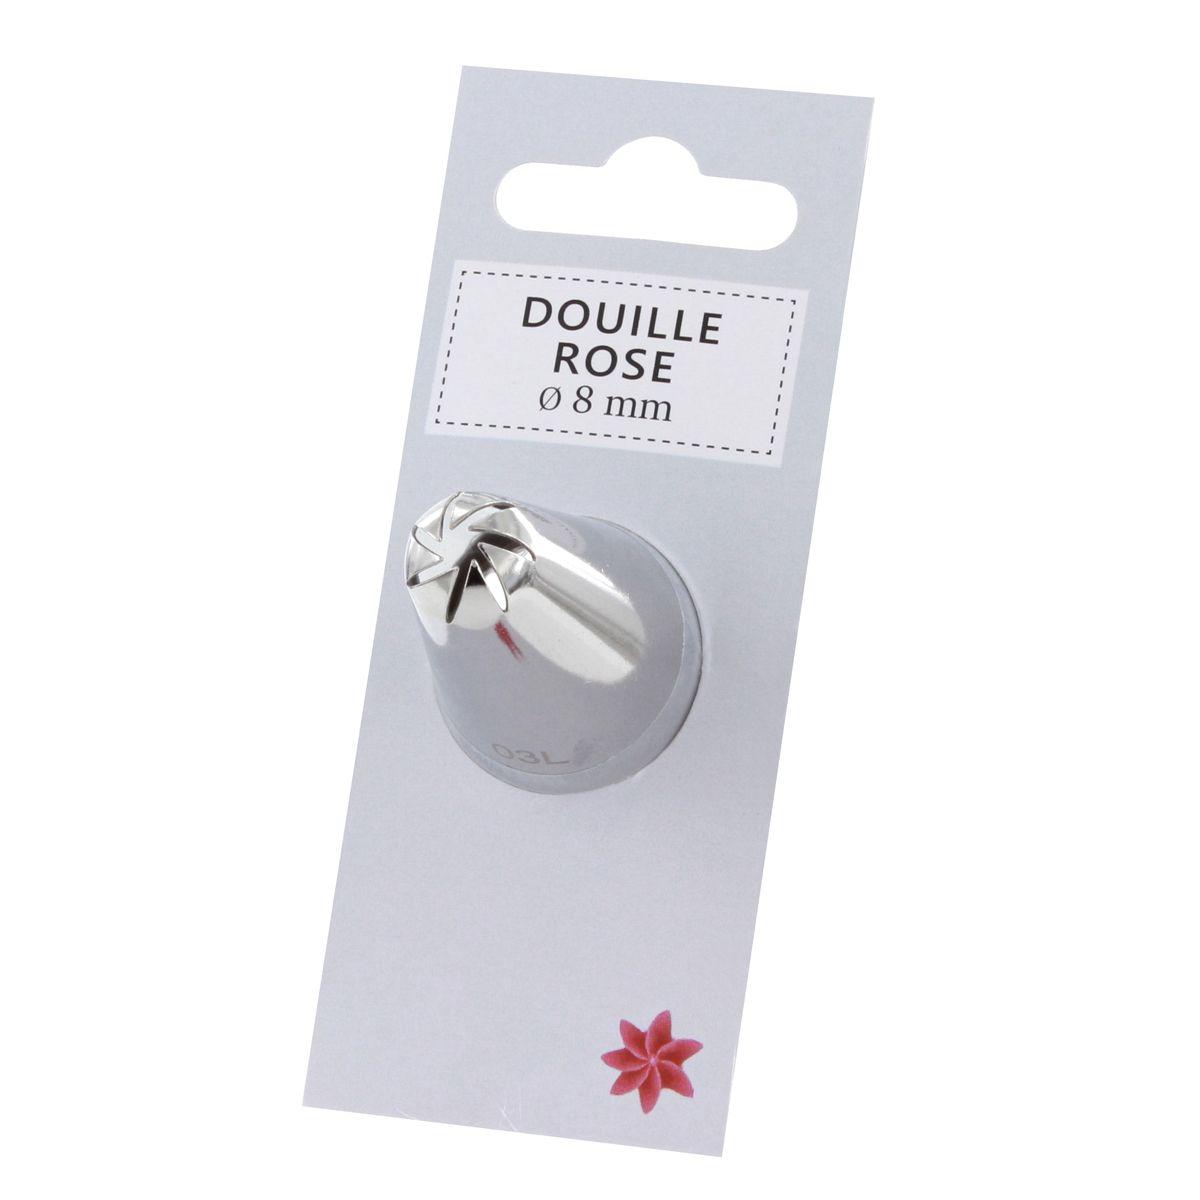 Douille inox rose 8 mm